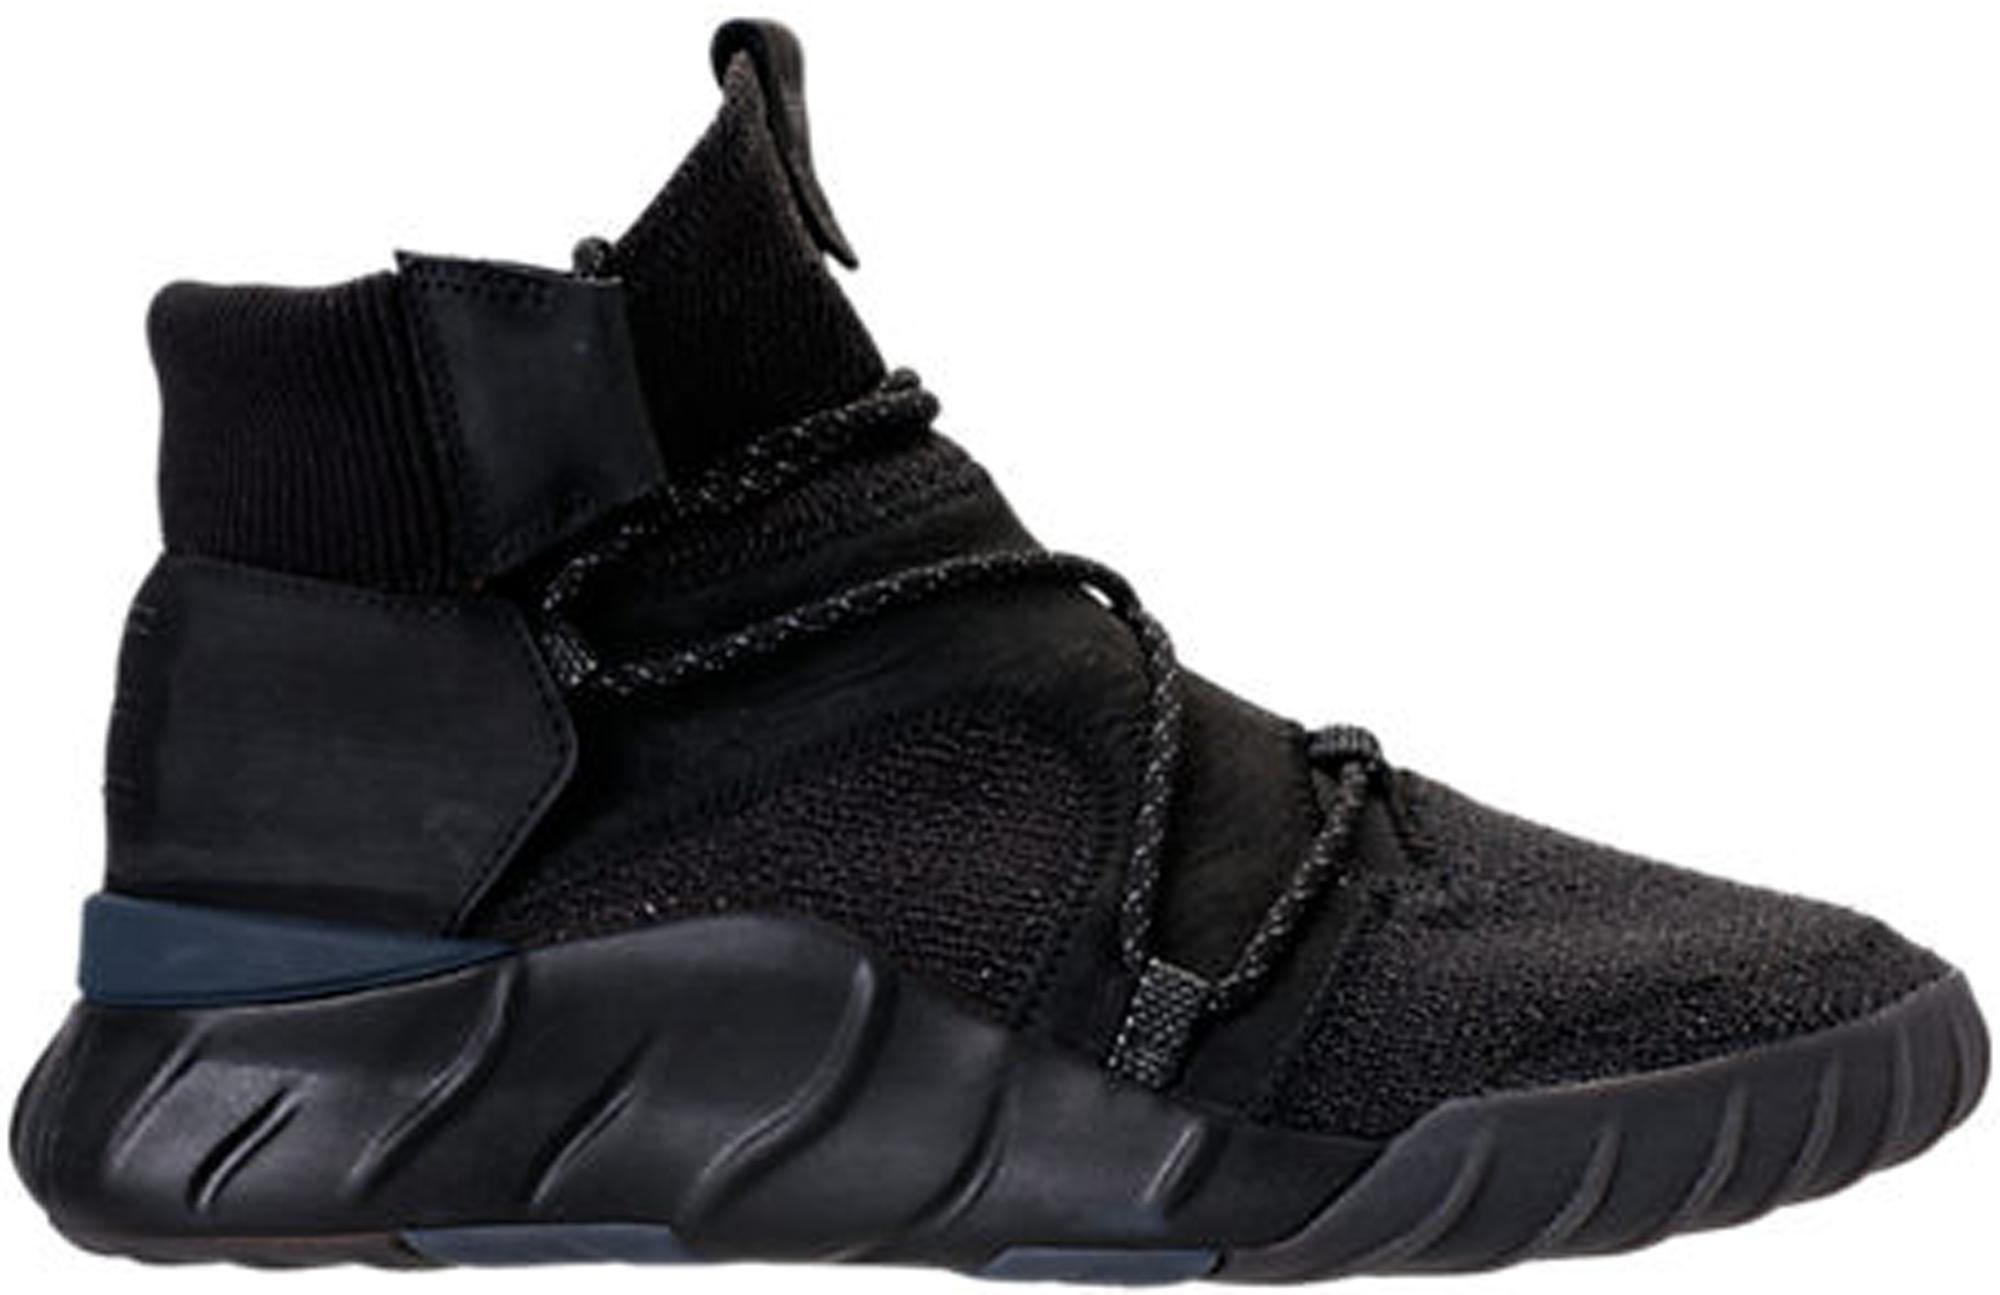 adidas Tubular X 2.0 Triple Black